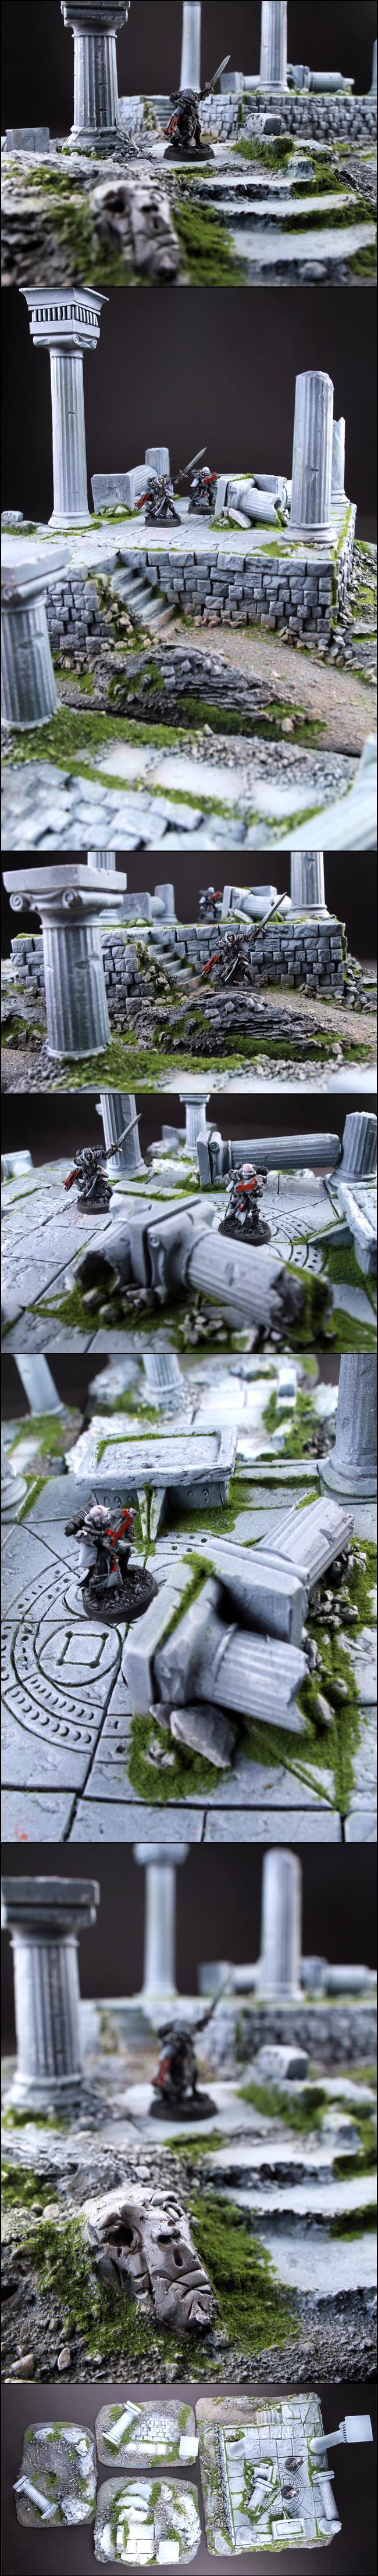 Ruin, Temple, Temple Ruin Scenery Terrain For 28mm Wargame Like 40k Dust At-43, Terrain